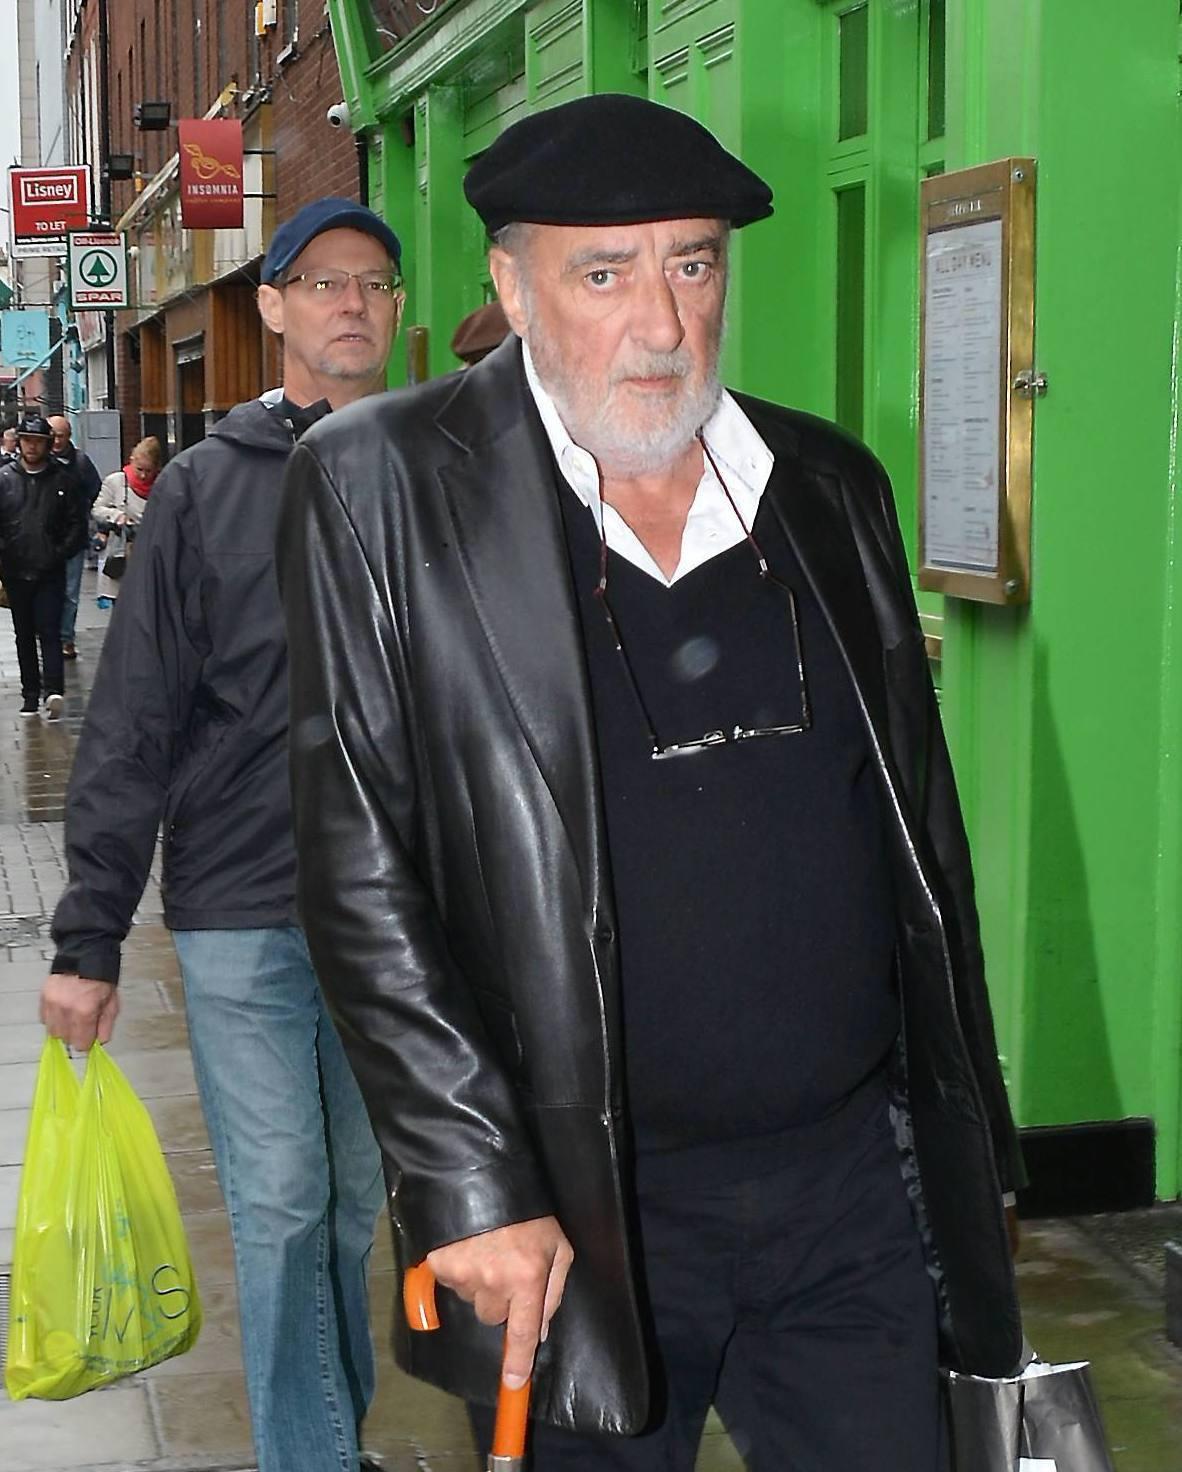 John McVie Fleetwood Mac